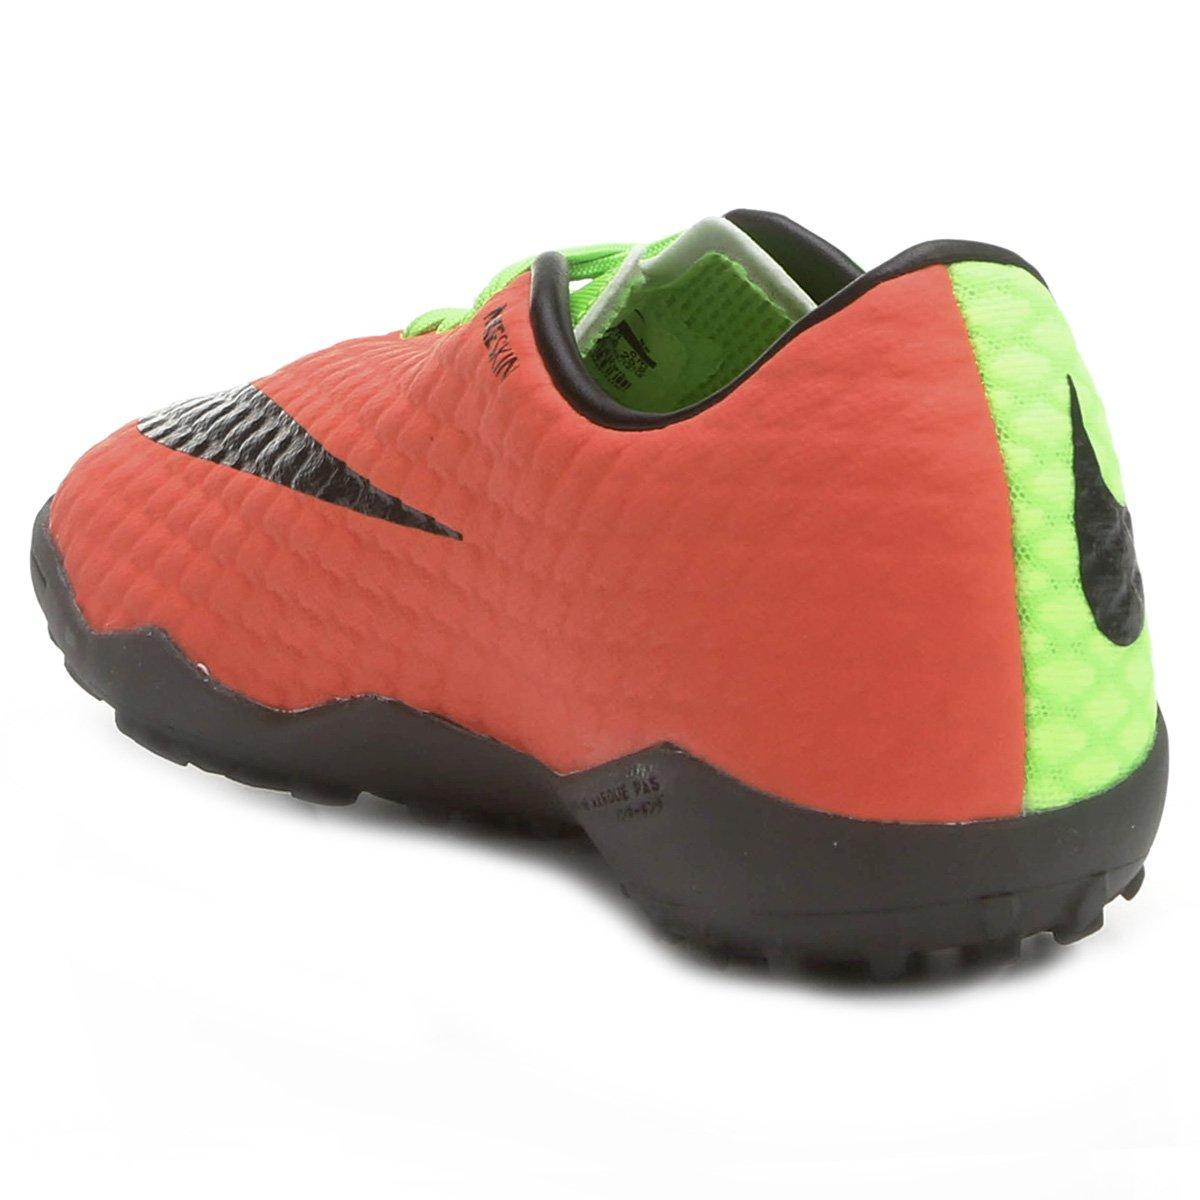 cd528eeb7f Chuteira Society Nike Hypervenom Phelon 3 TF - Compre Agora